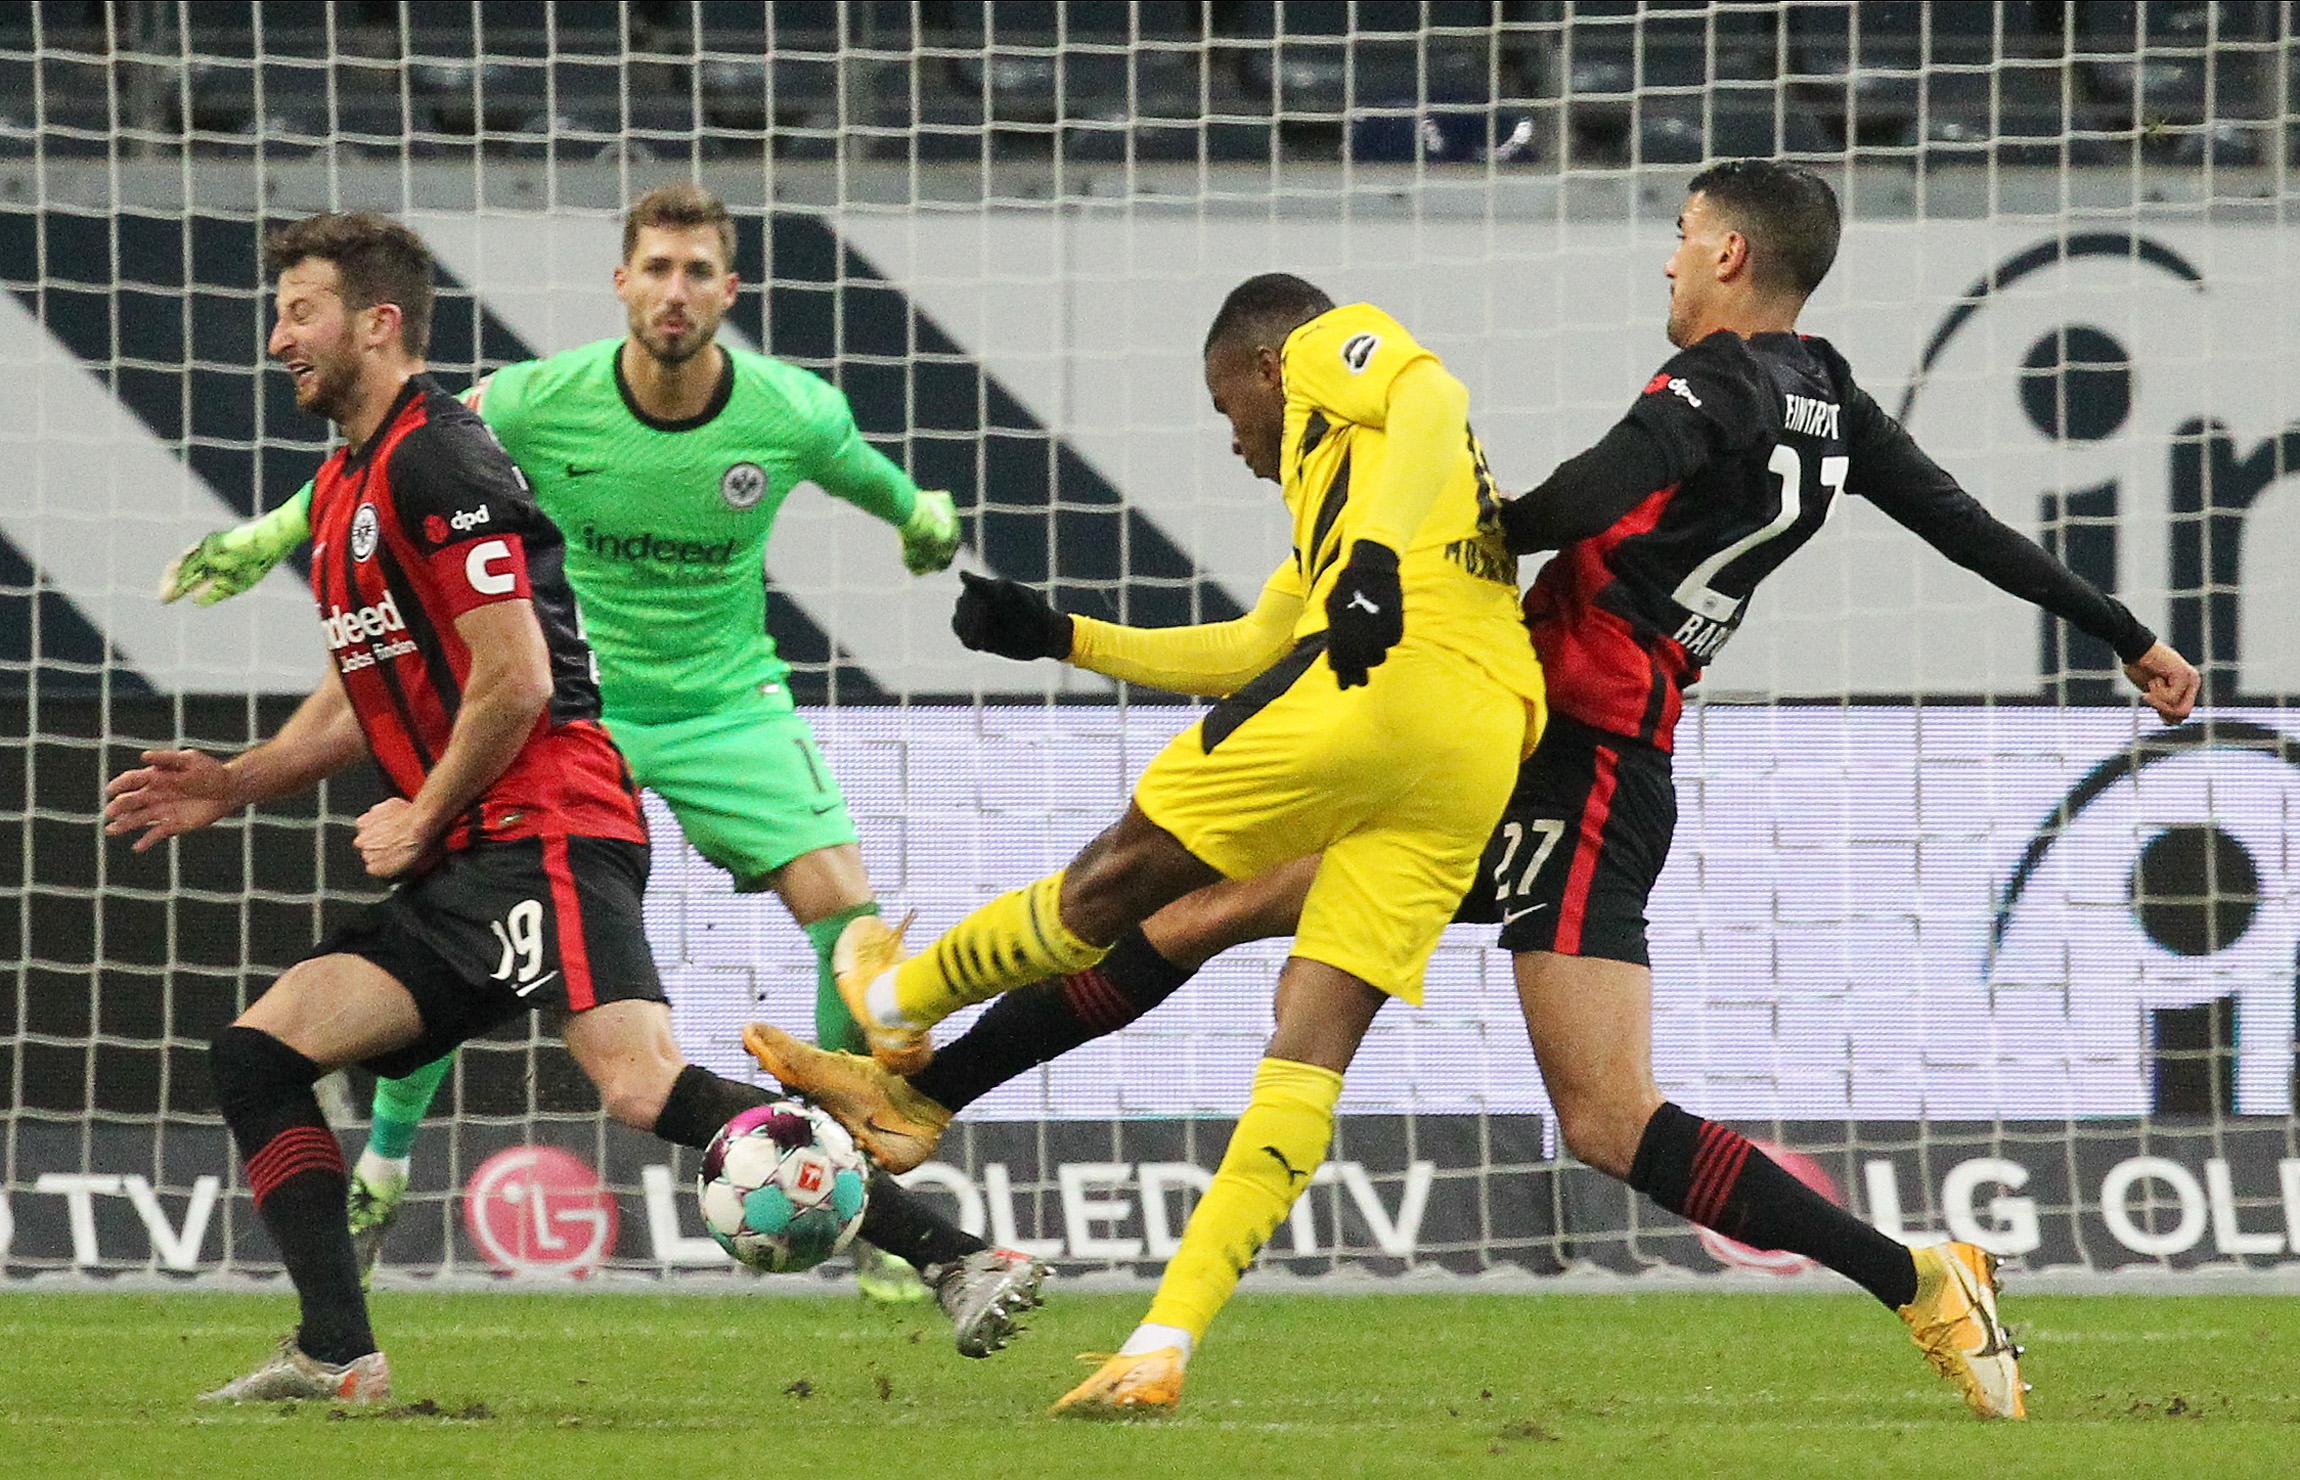 Bundesliga: Νέα απώλεια βαθμών για την Ντόρτμουντ! Γκέλα για την Γκλάντμπαχ (videos)